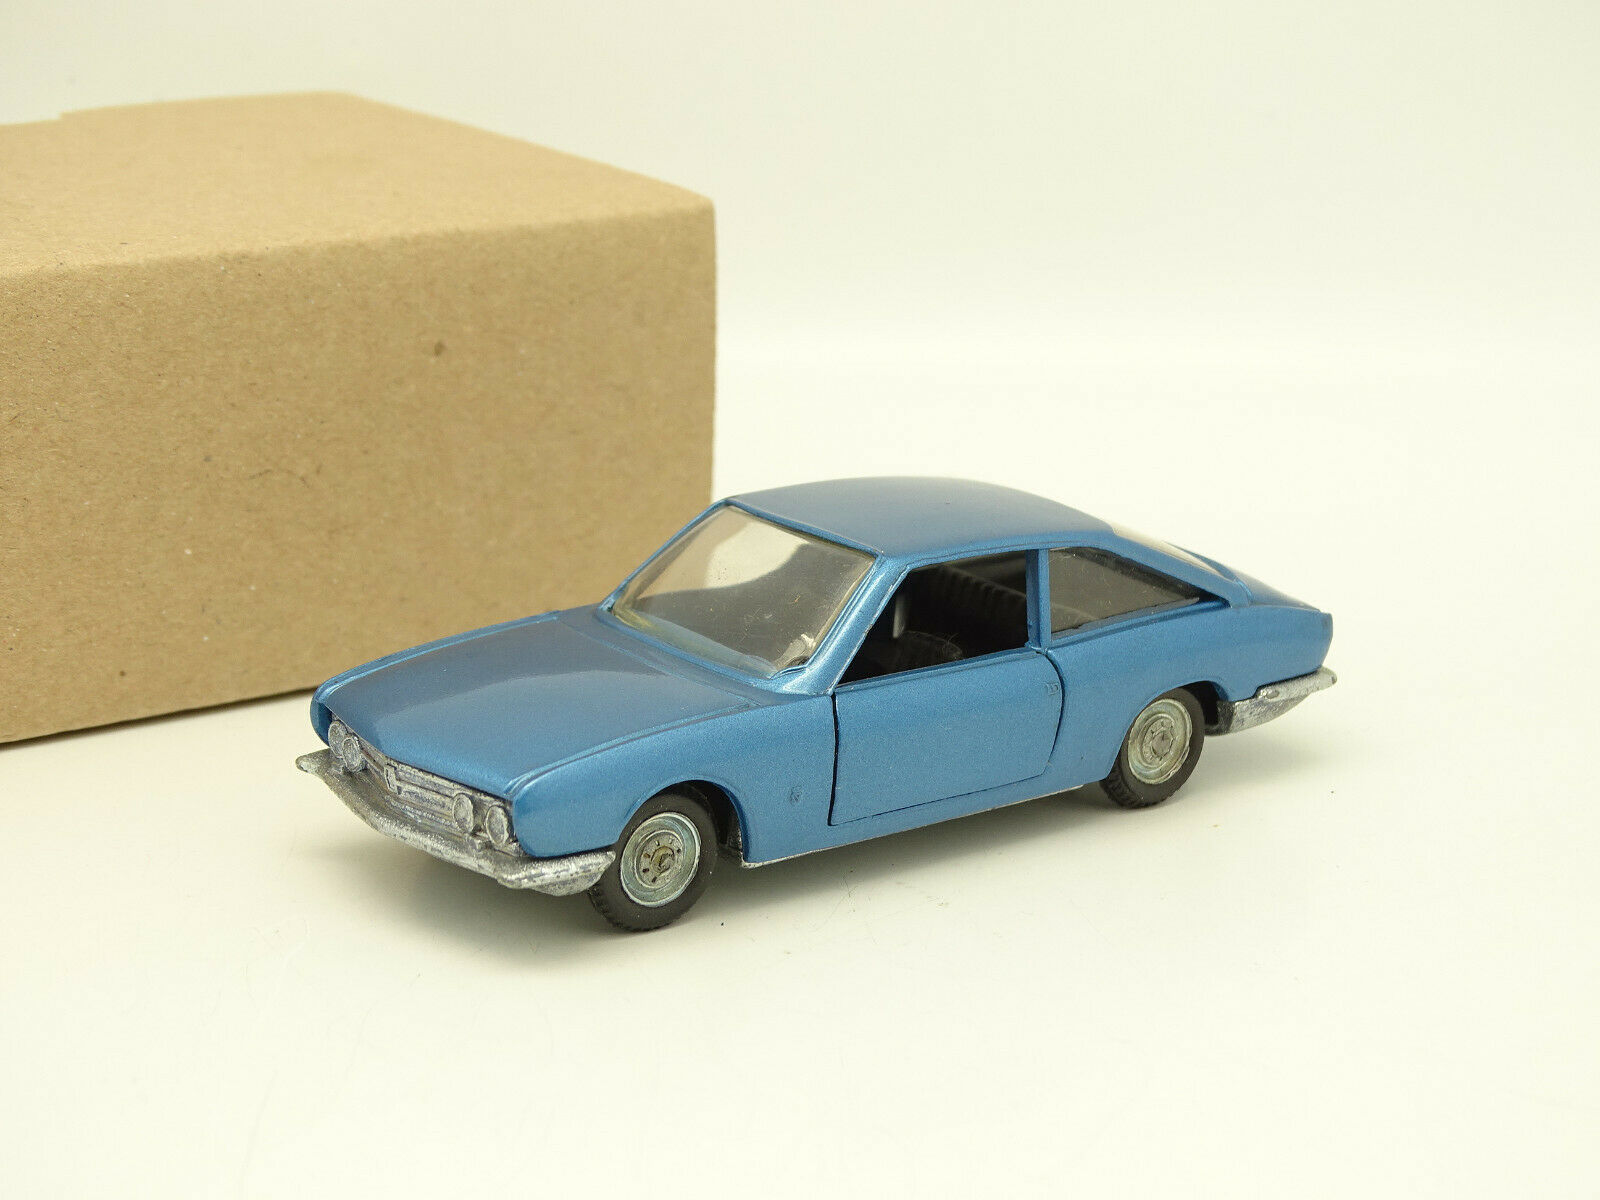 Politoys 1 43 Ghia ISUZU 117 Sport Light bluee